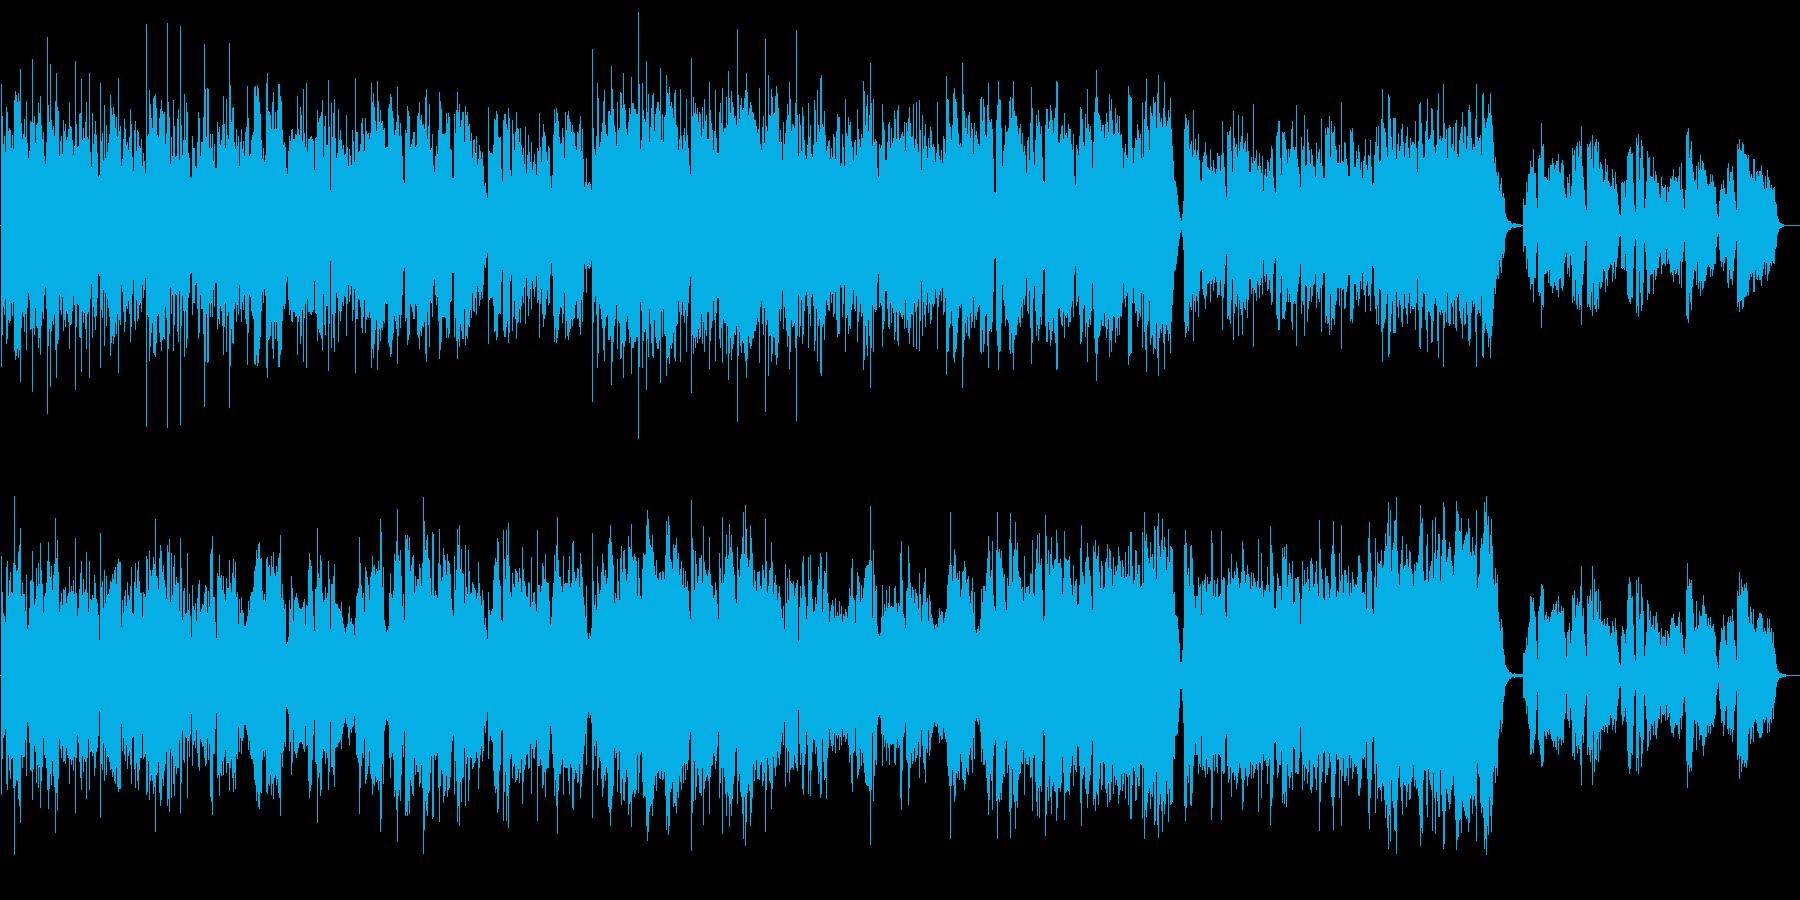 CM販売促進・企業VP向け明るい癒し系歌の再生済みの波形